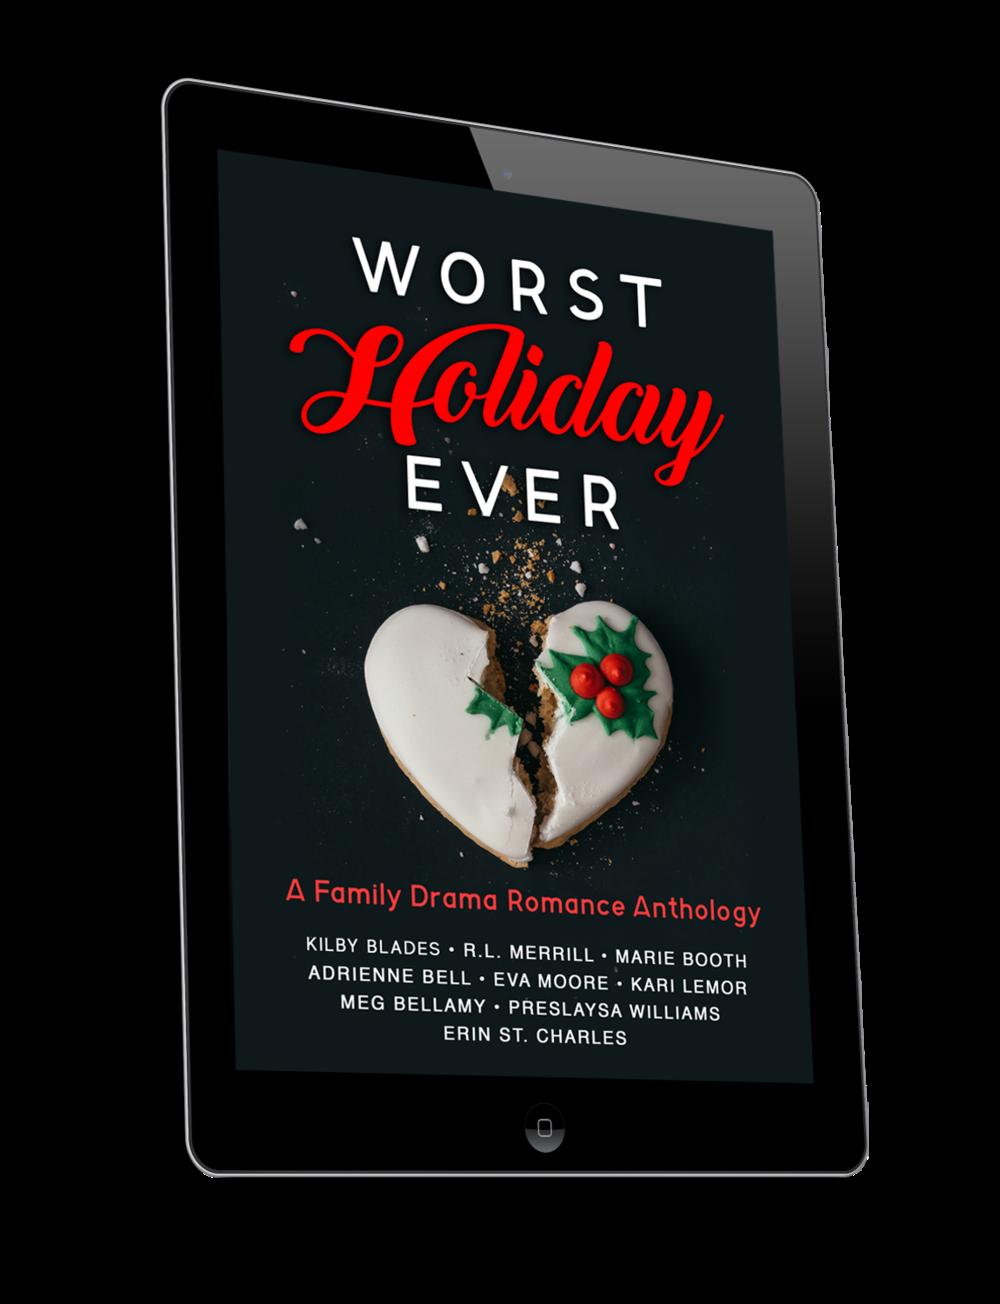 Worst Holiday Ever Kilby Blades